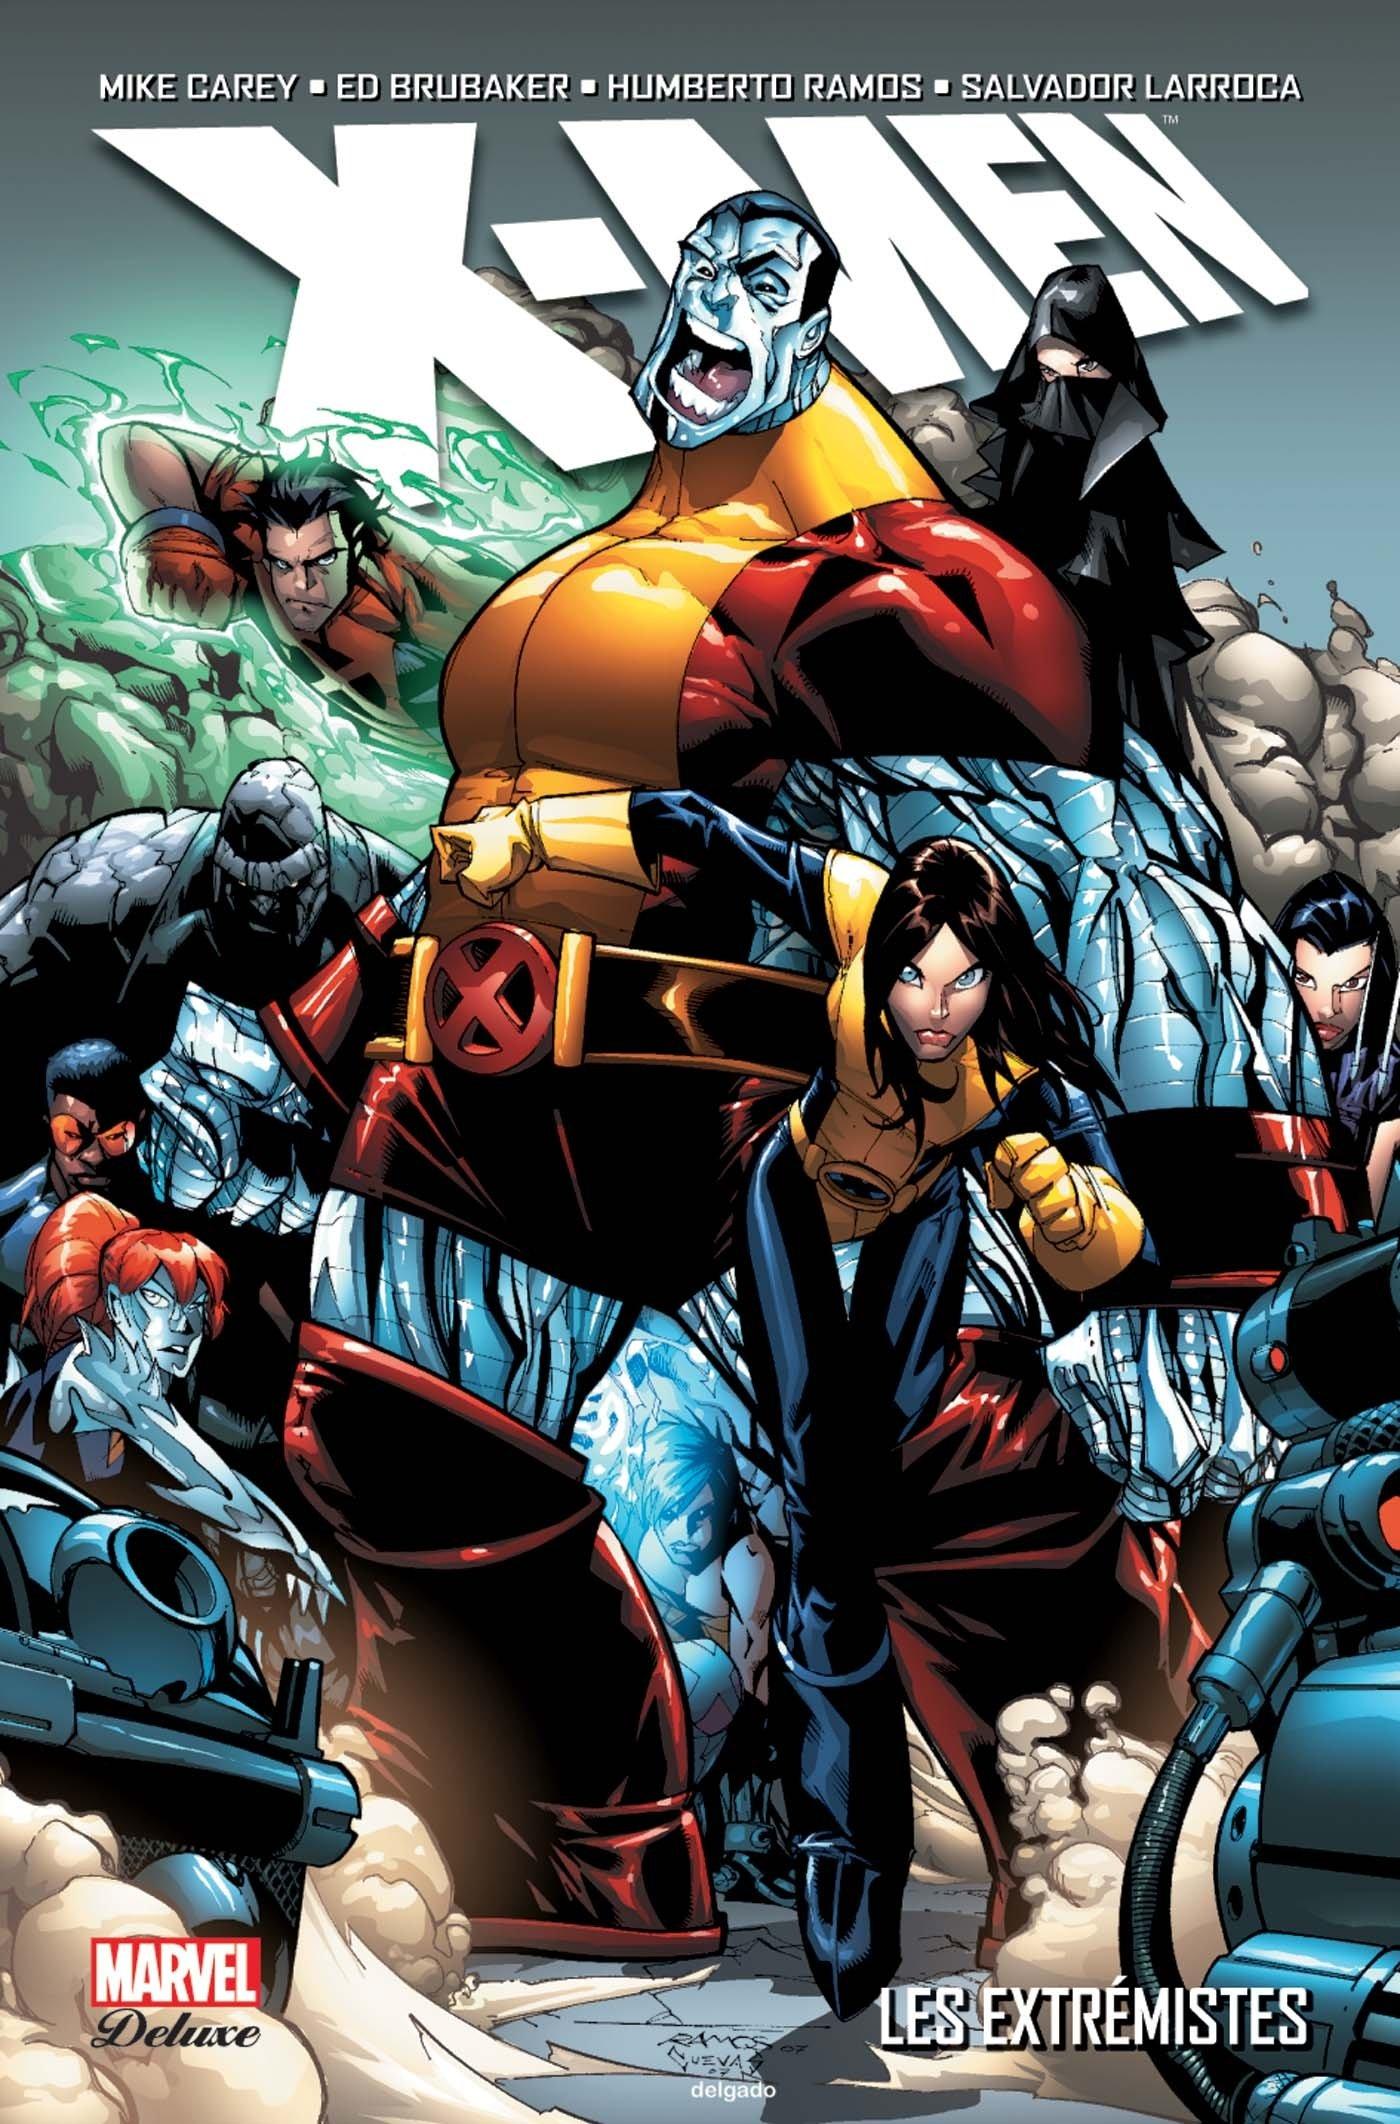 X-Men : Les extrémistes Album – 21 mars 2018 Chris Bachalo Salvador Larroca Ed Brubaker Humberto Ramos